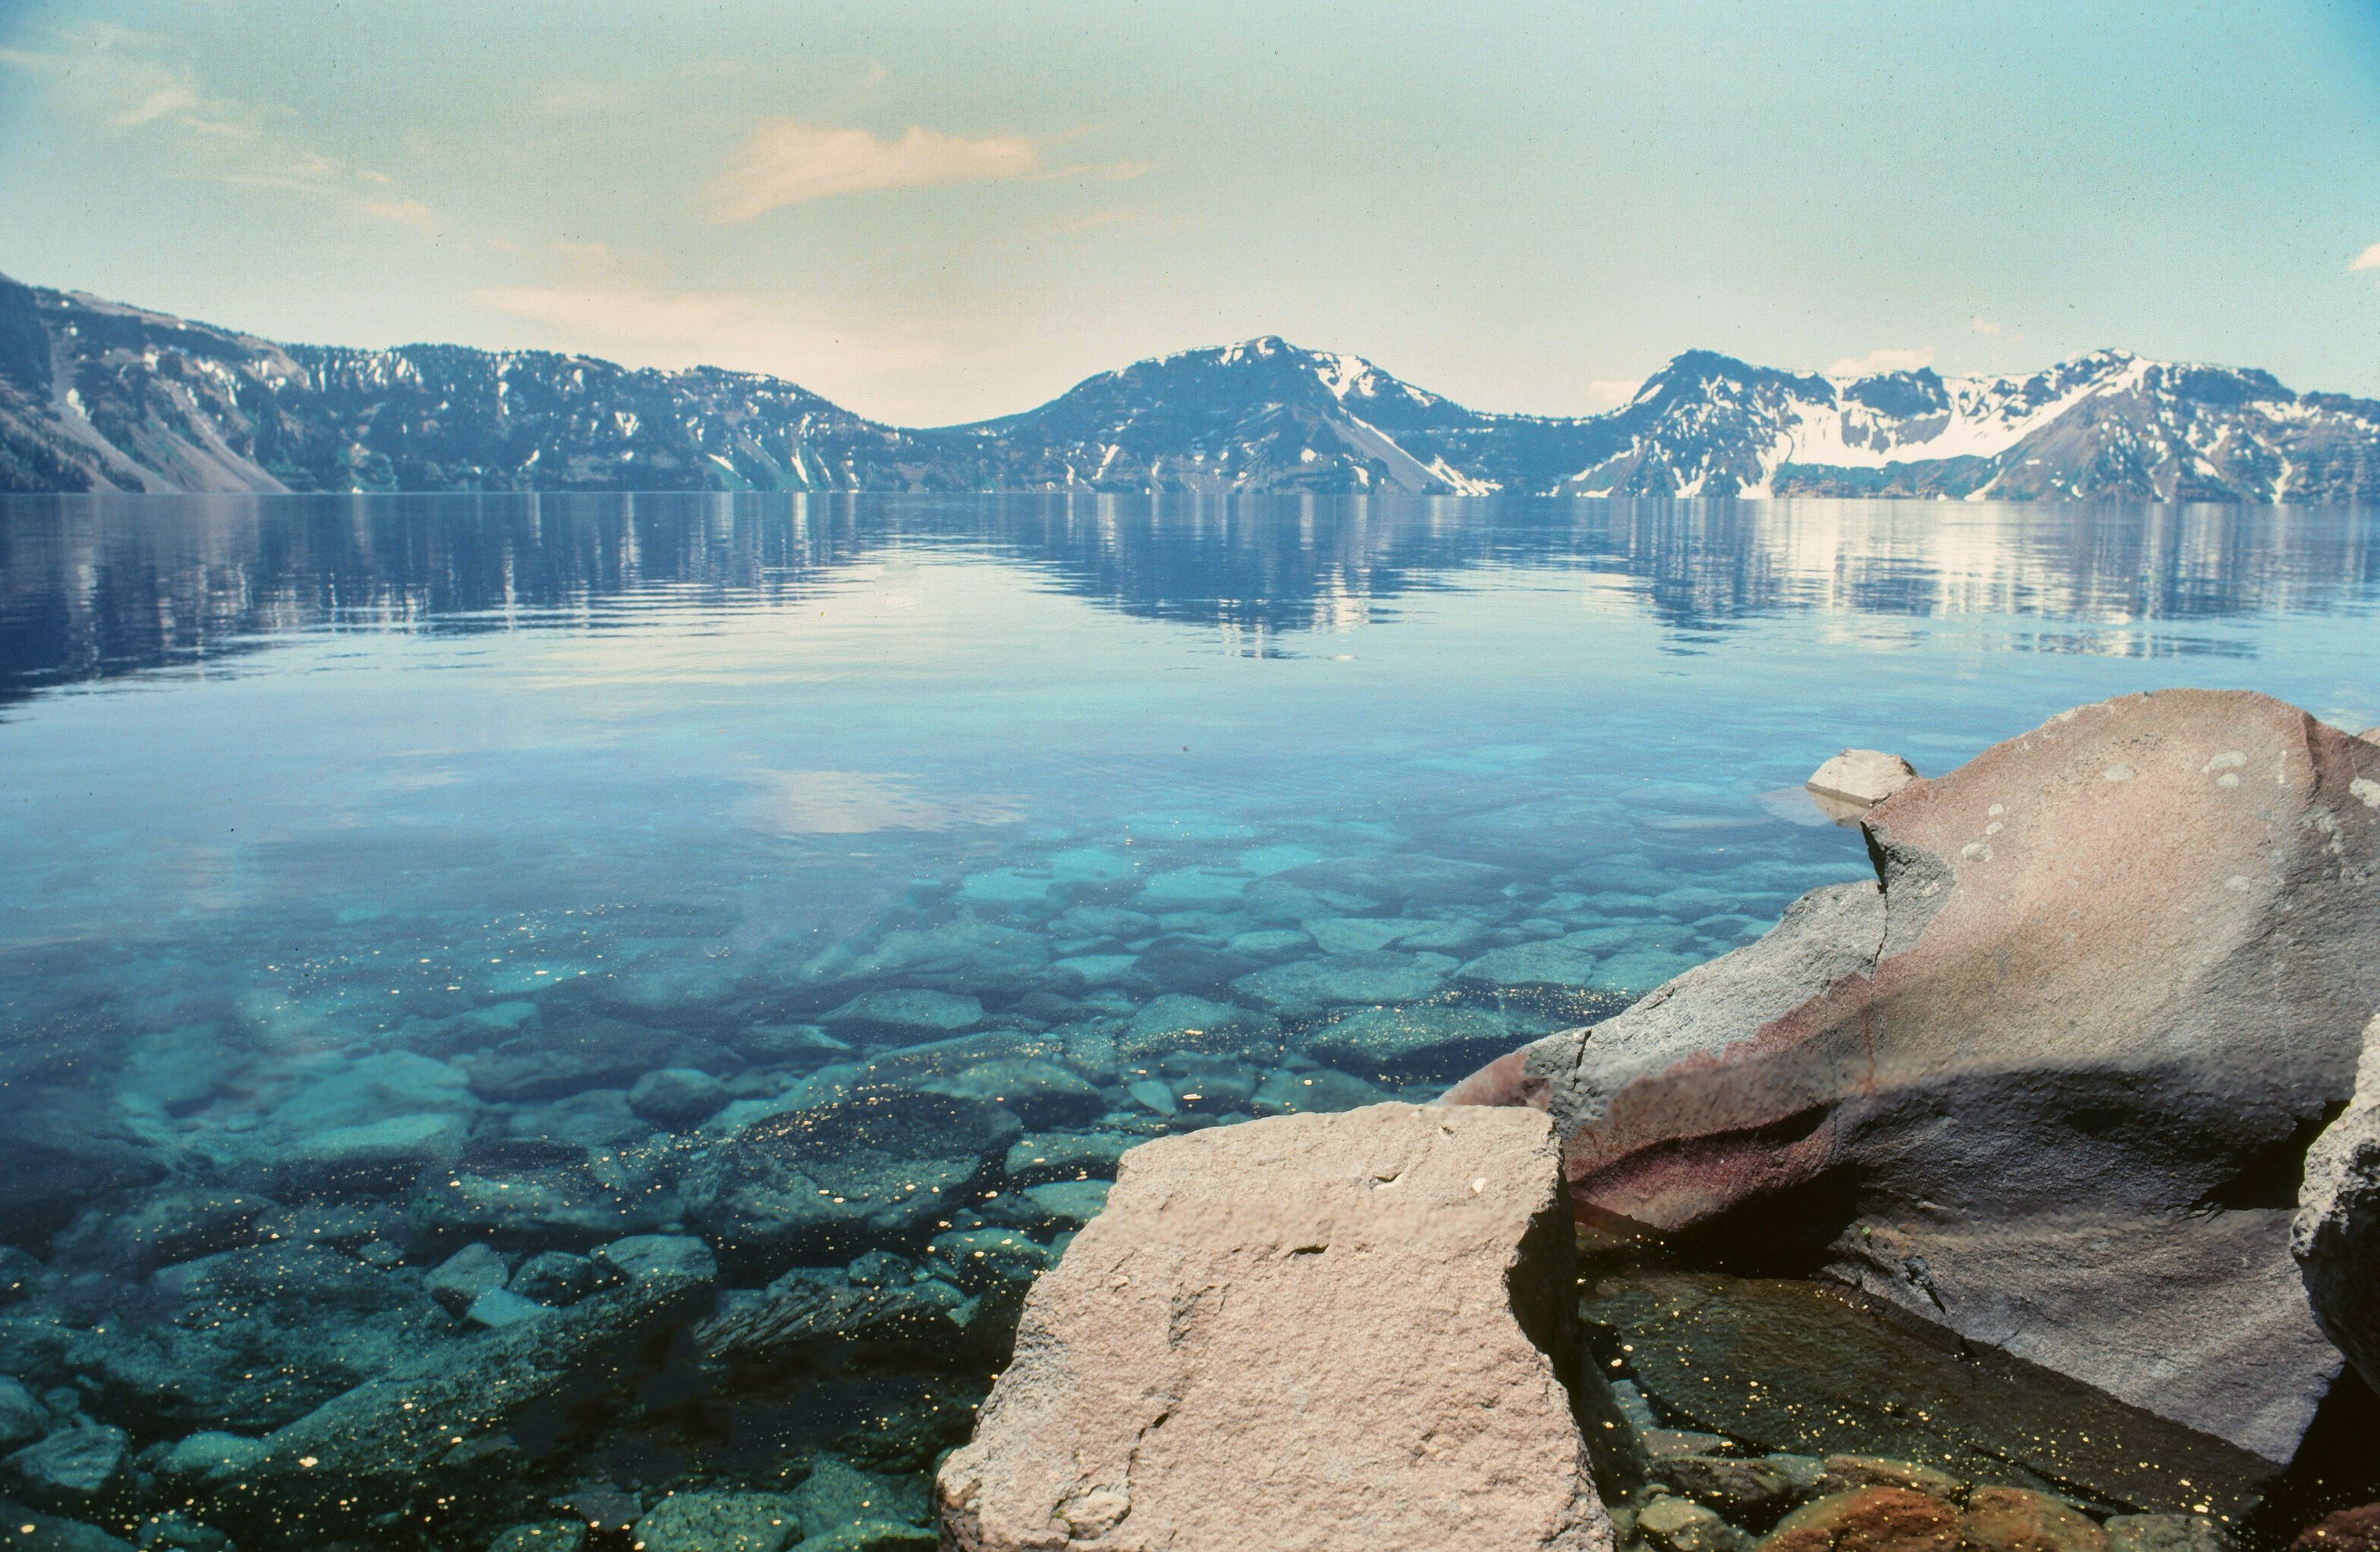 The shoreline of Crater Lake, Oregon